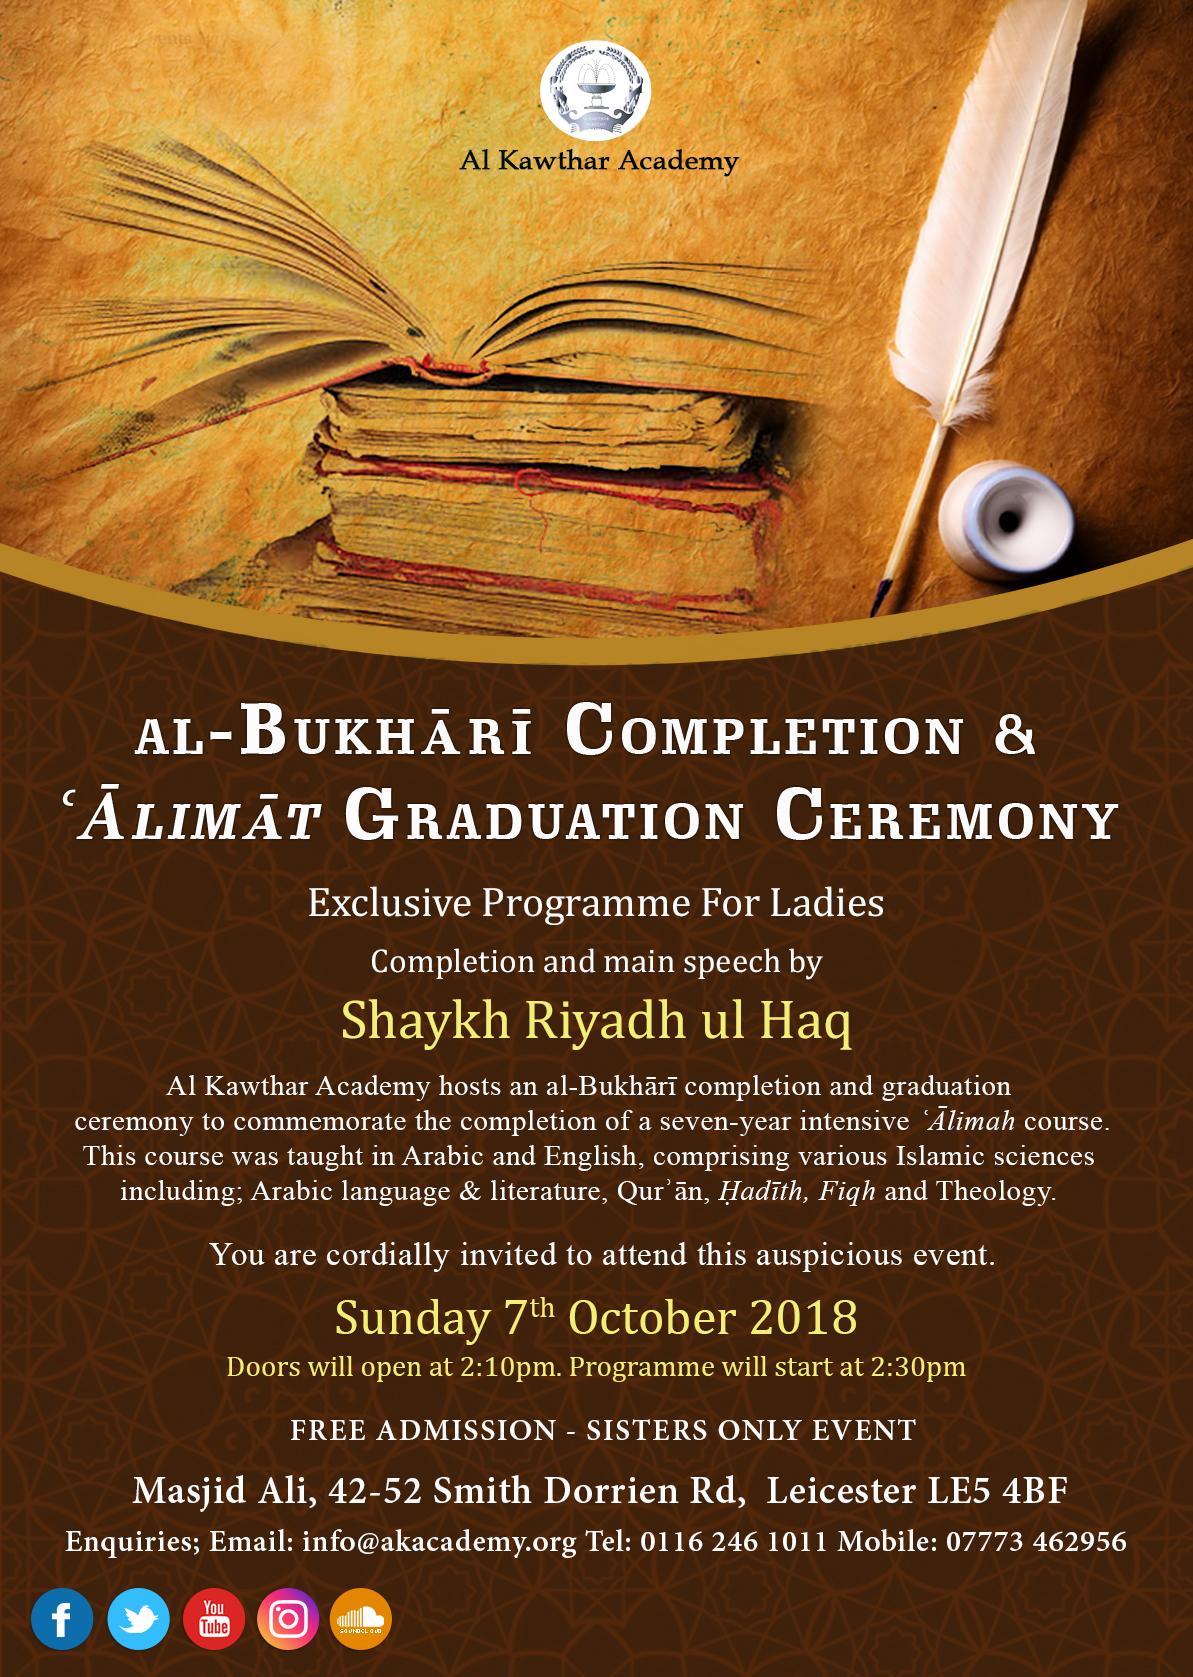 Al-Bukhari Completion & 'Alimat Graduation Ceremony